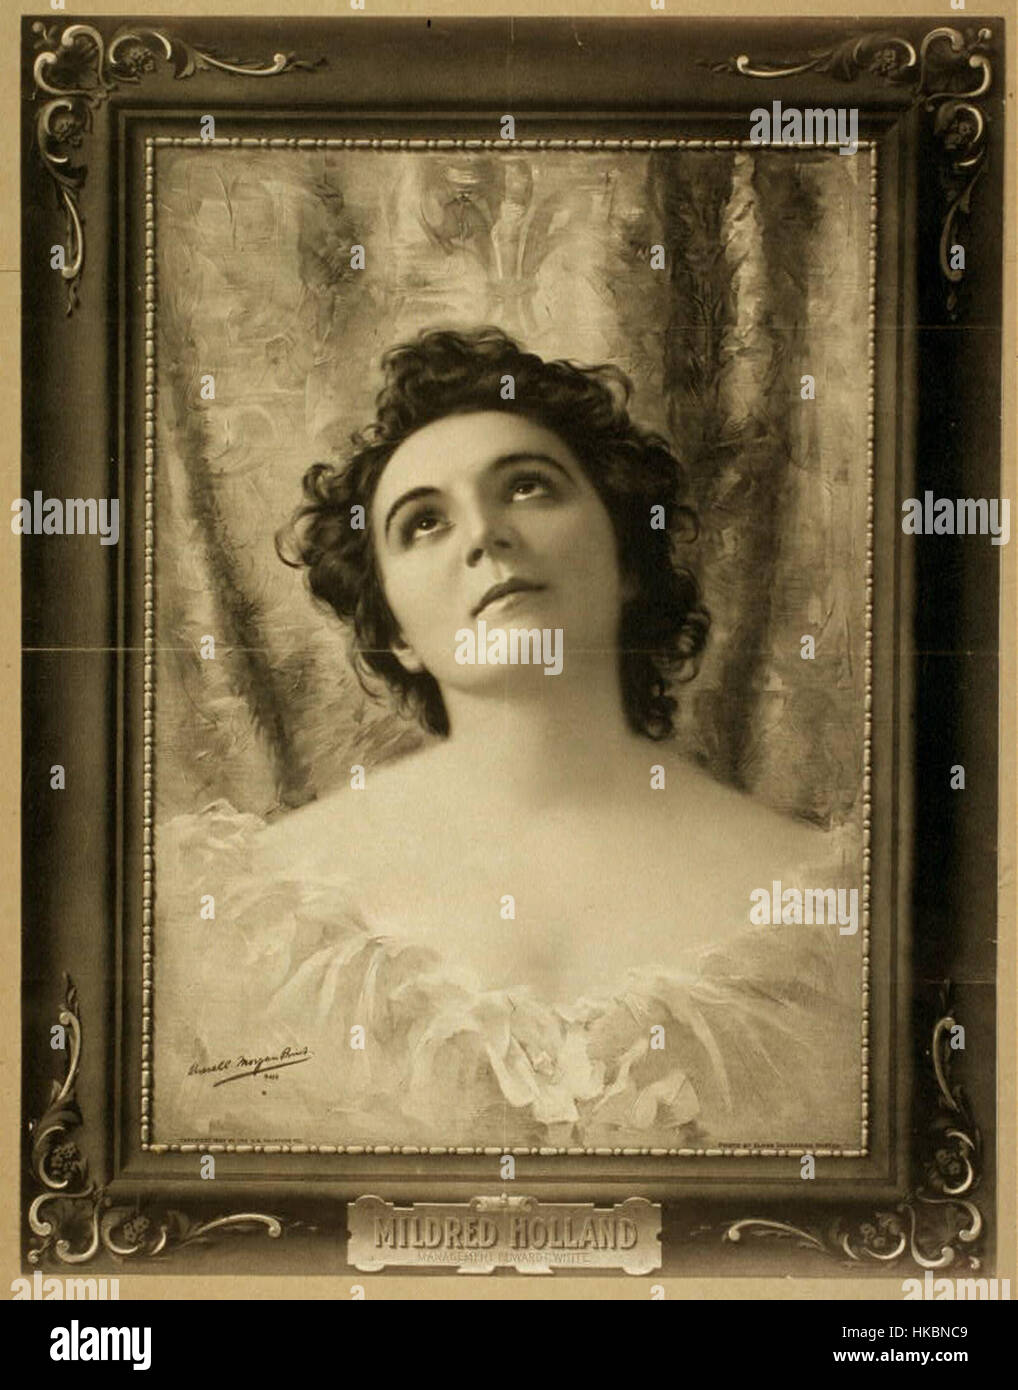 1899 MildredHolland byElmerChickering LibraryOfCongress - Stock Image